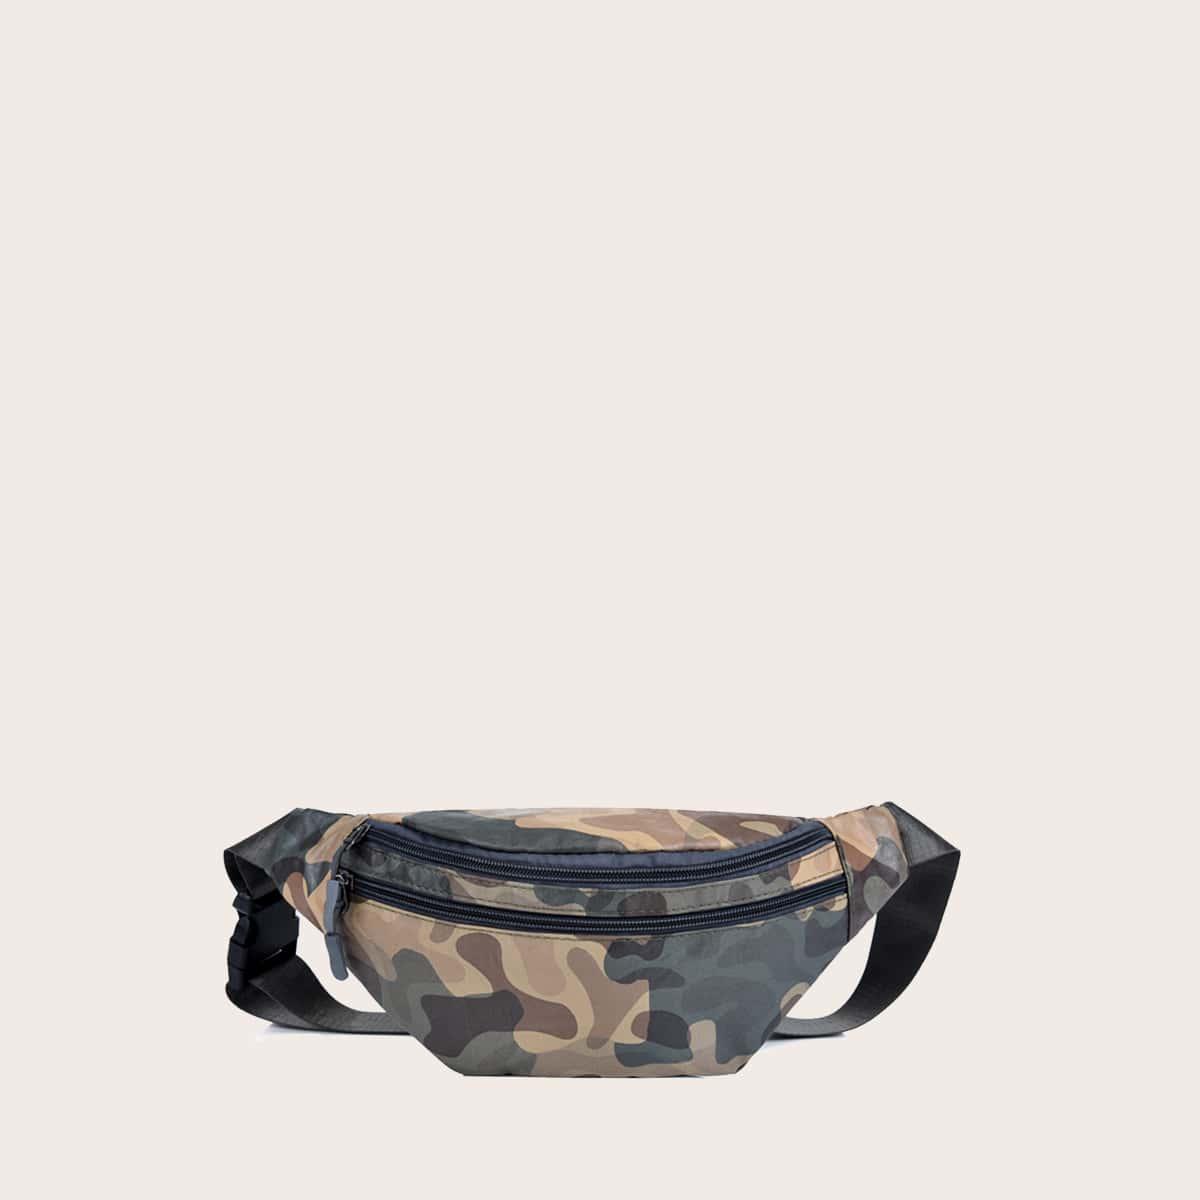 shein Verstelbaar Camouflage Heuptas